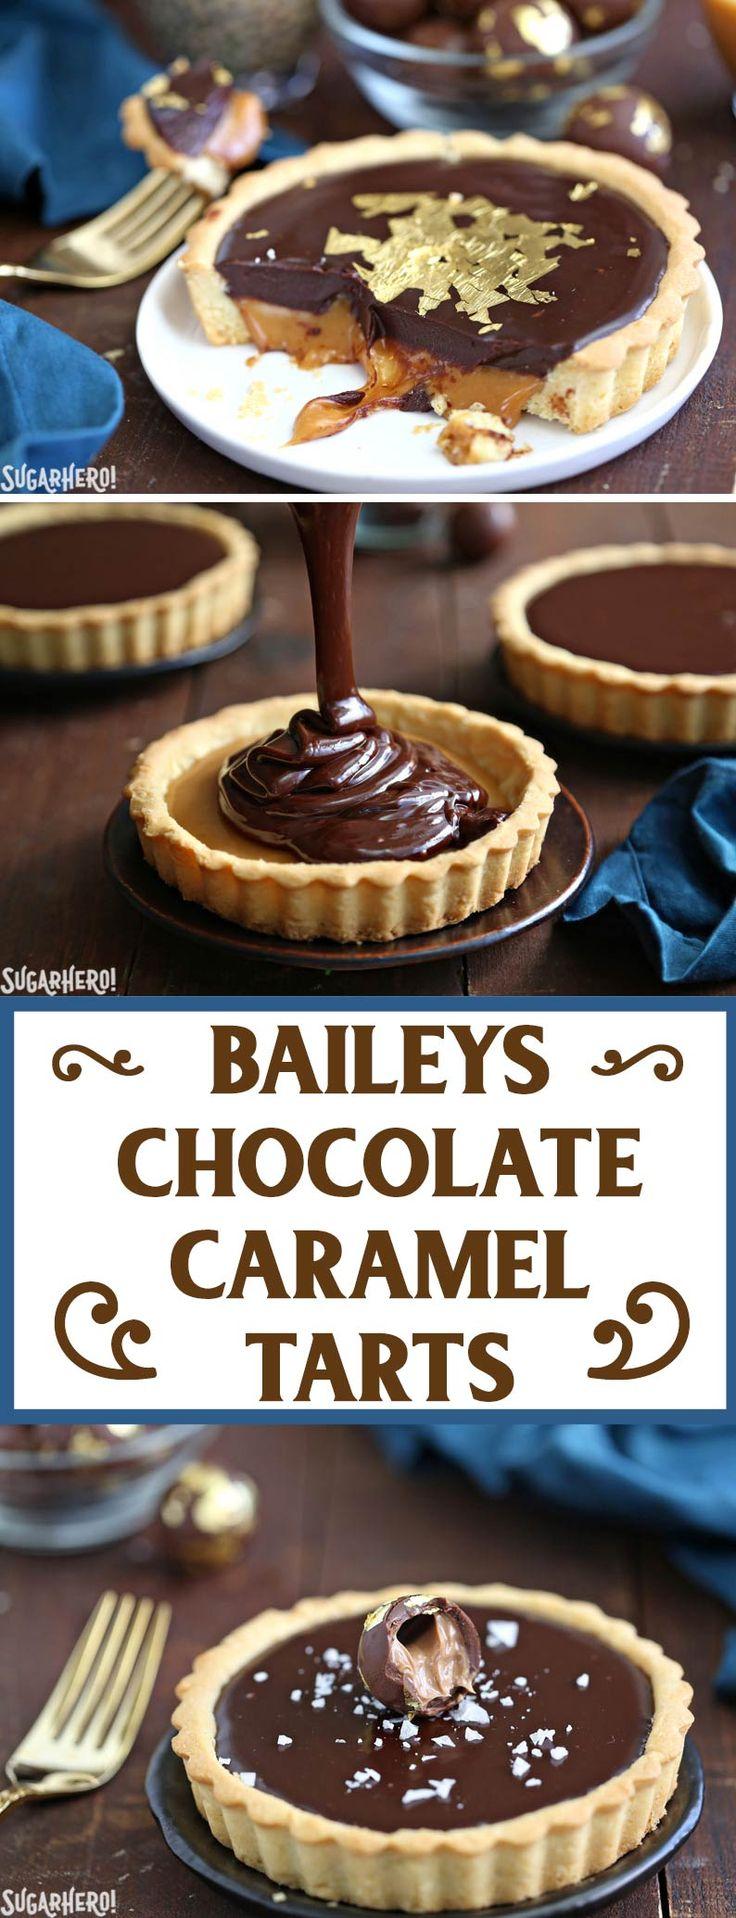 Baileys Chocolate Caramel Tarts - gorgeous mini tarts with a Baileys salted caramel filling and Baileys chocolate ganache! | From SugarHero.com